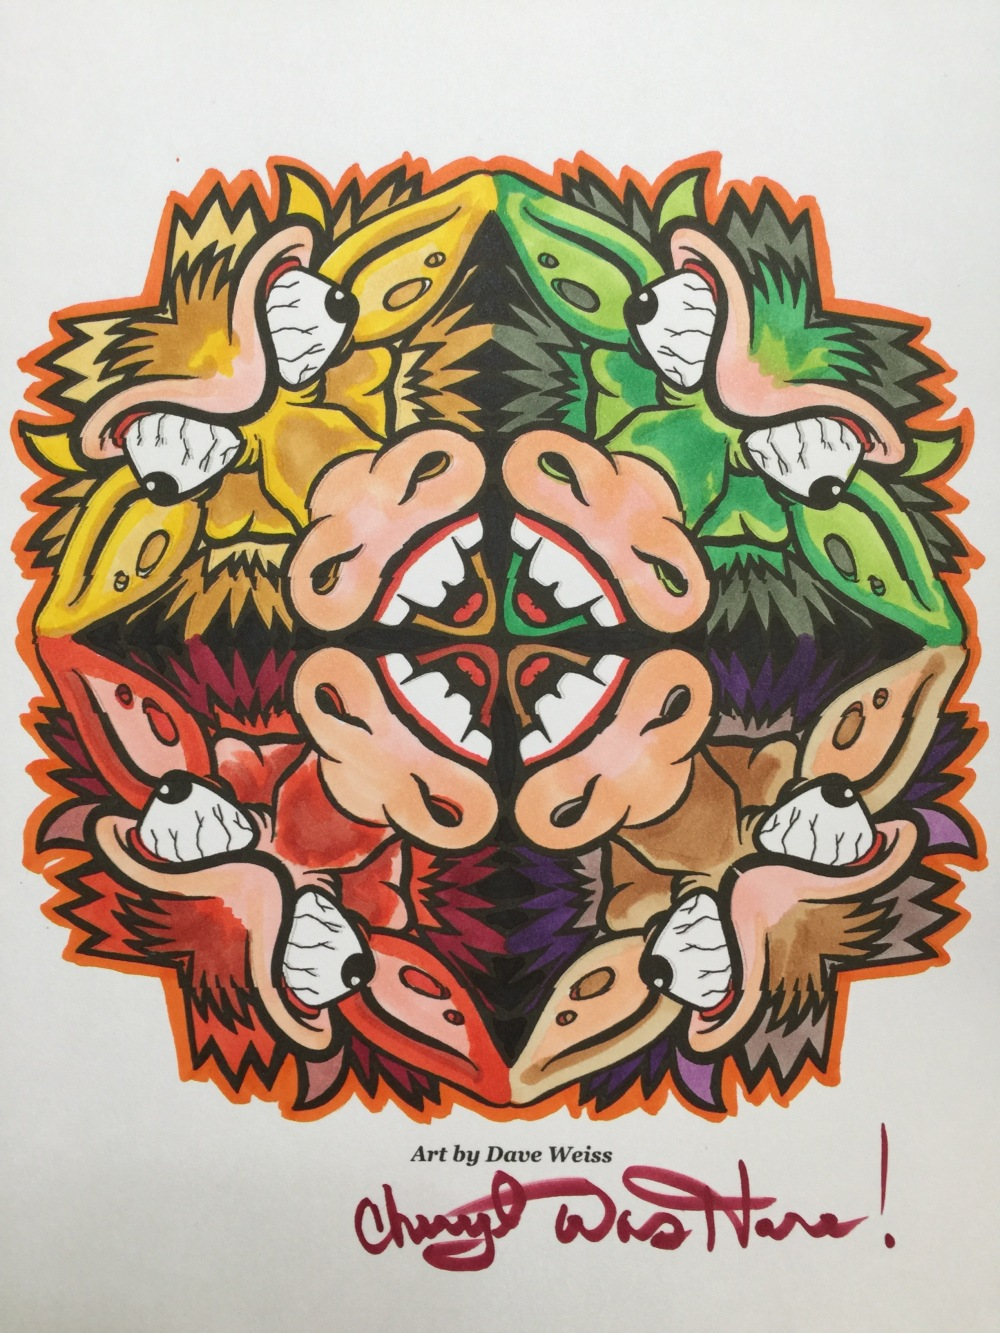 #cherylcolors art by David Weiss